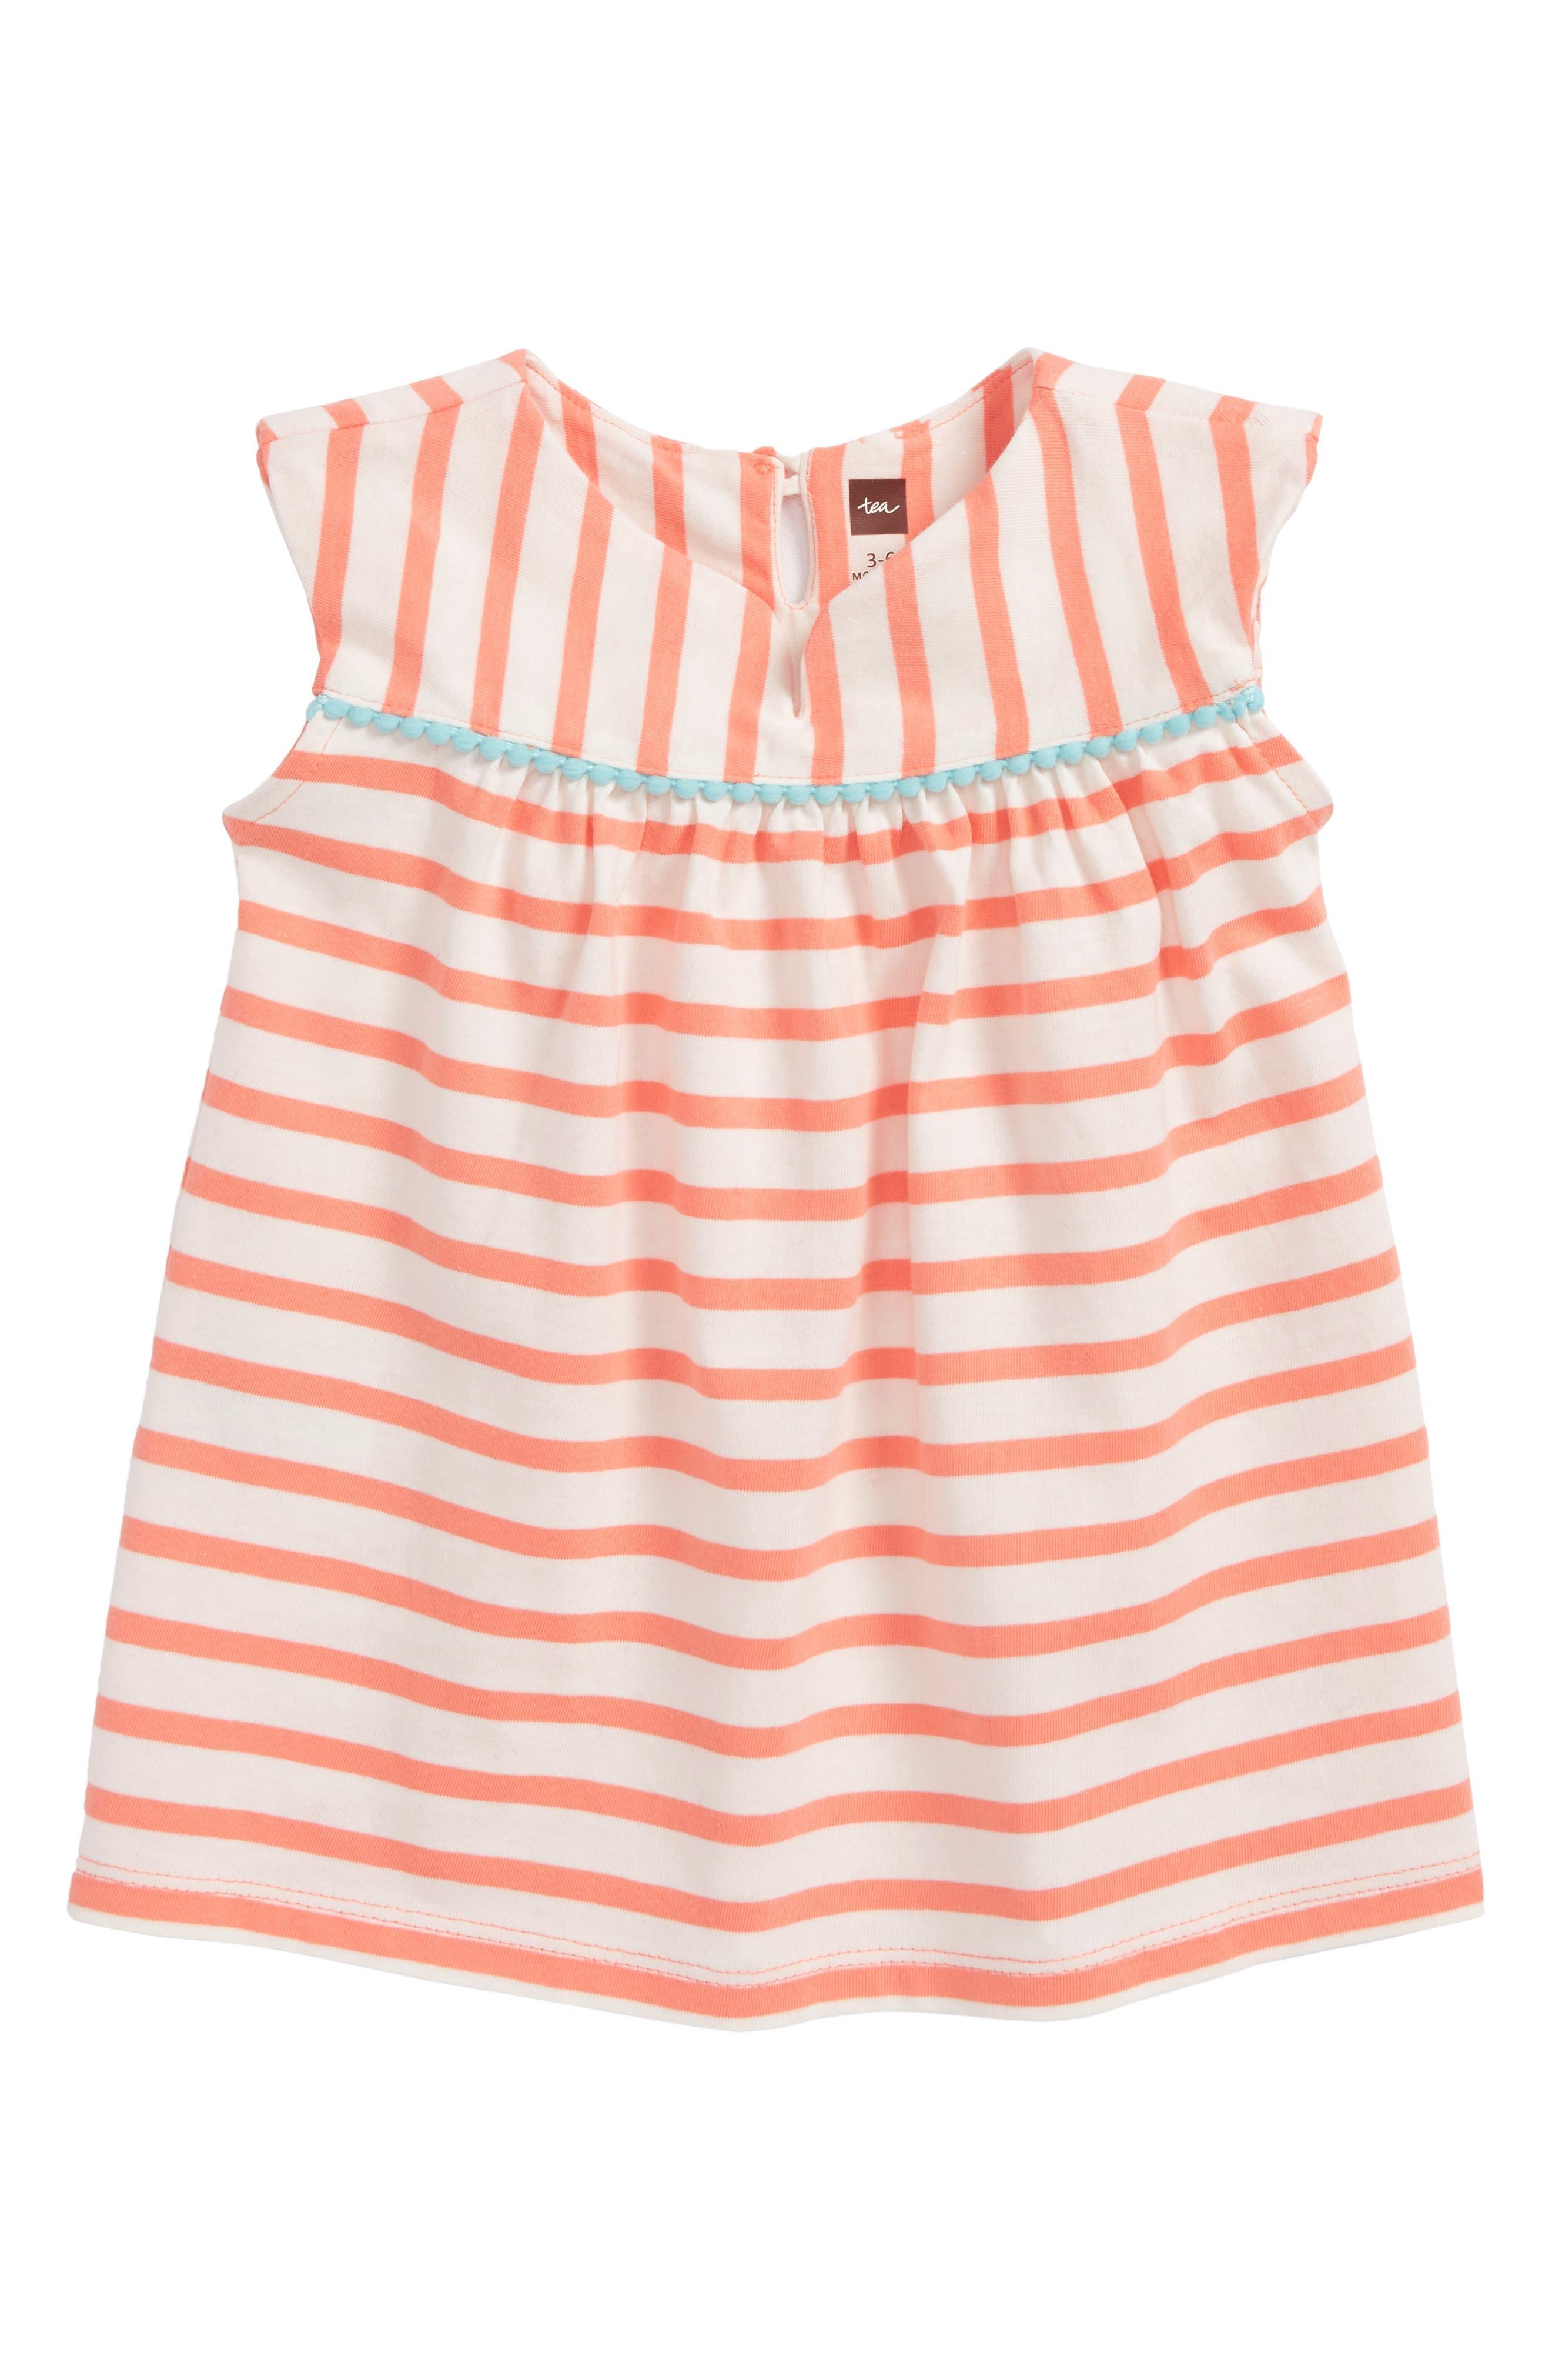 Tea Collection Pompom Dress (Baby Girls)